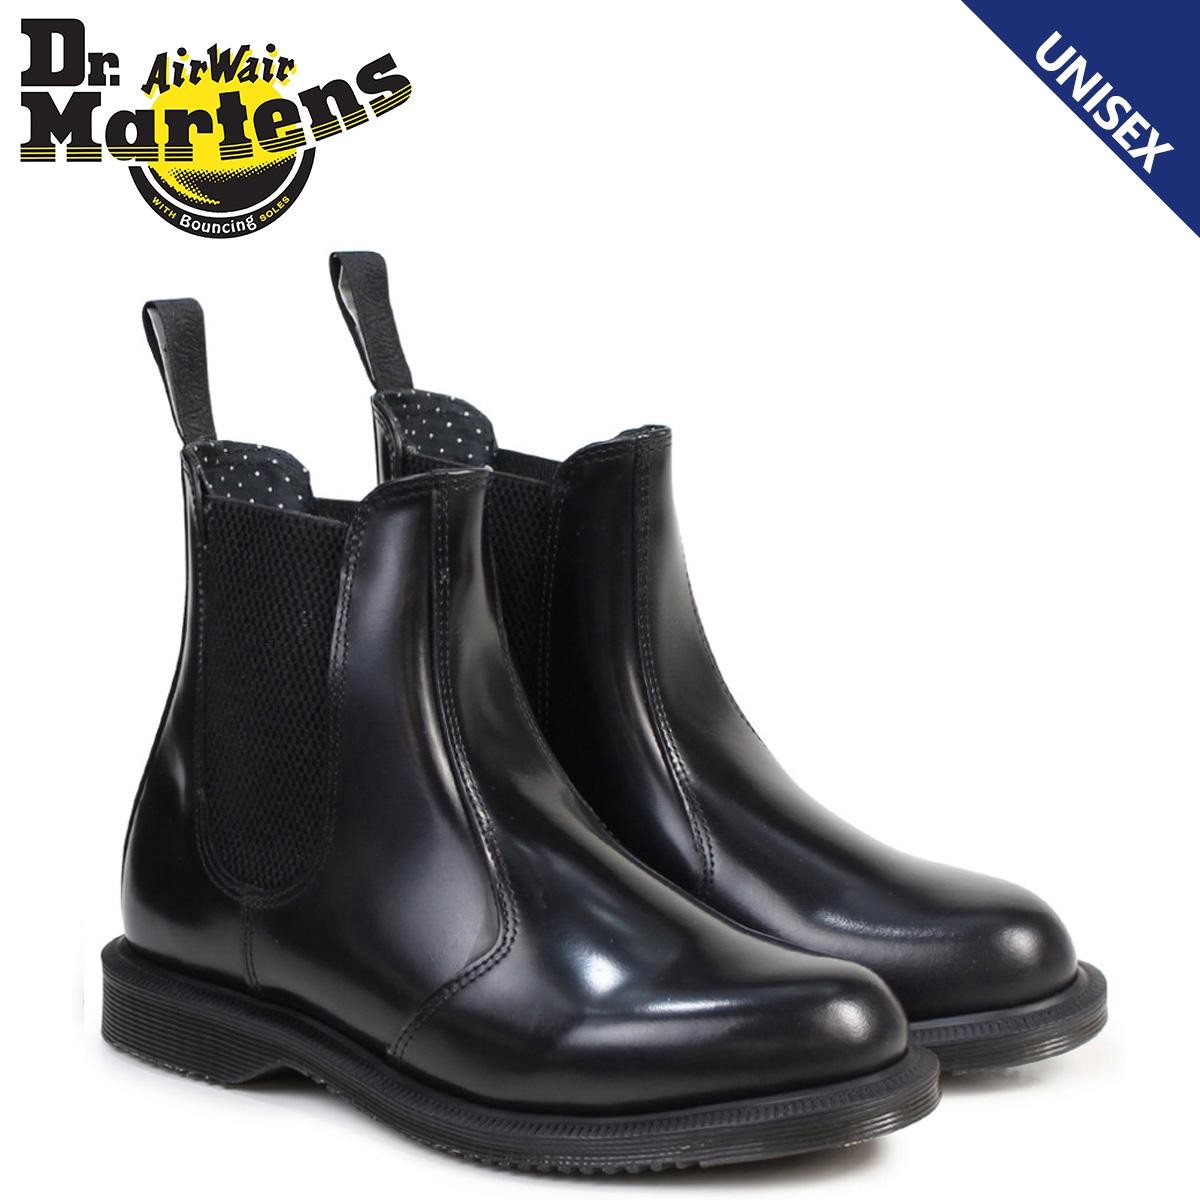 Dr.Martens サイドゴア レディース メンズ ドクターマーチン ブーツ チェルシーブーツ FLORA CHELSEA BOOT R14649001